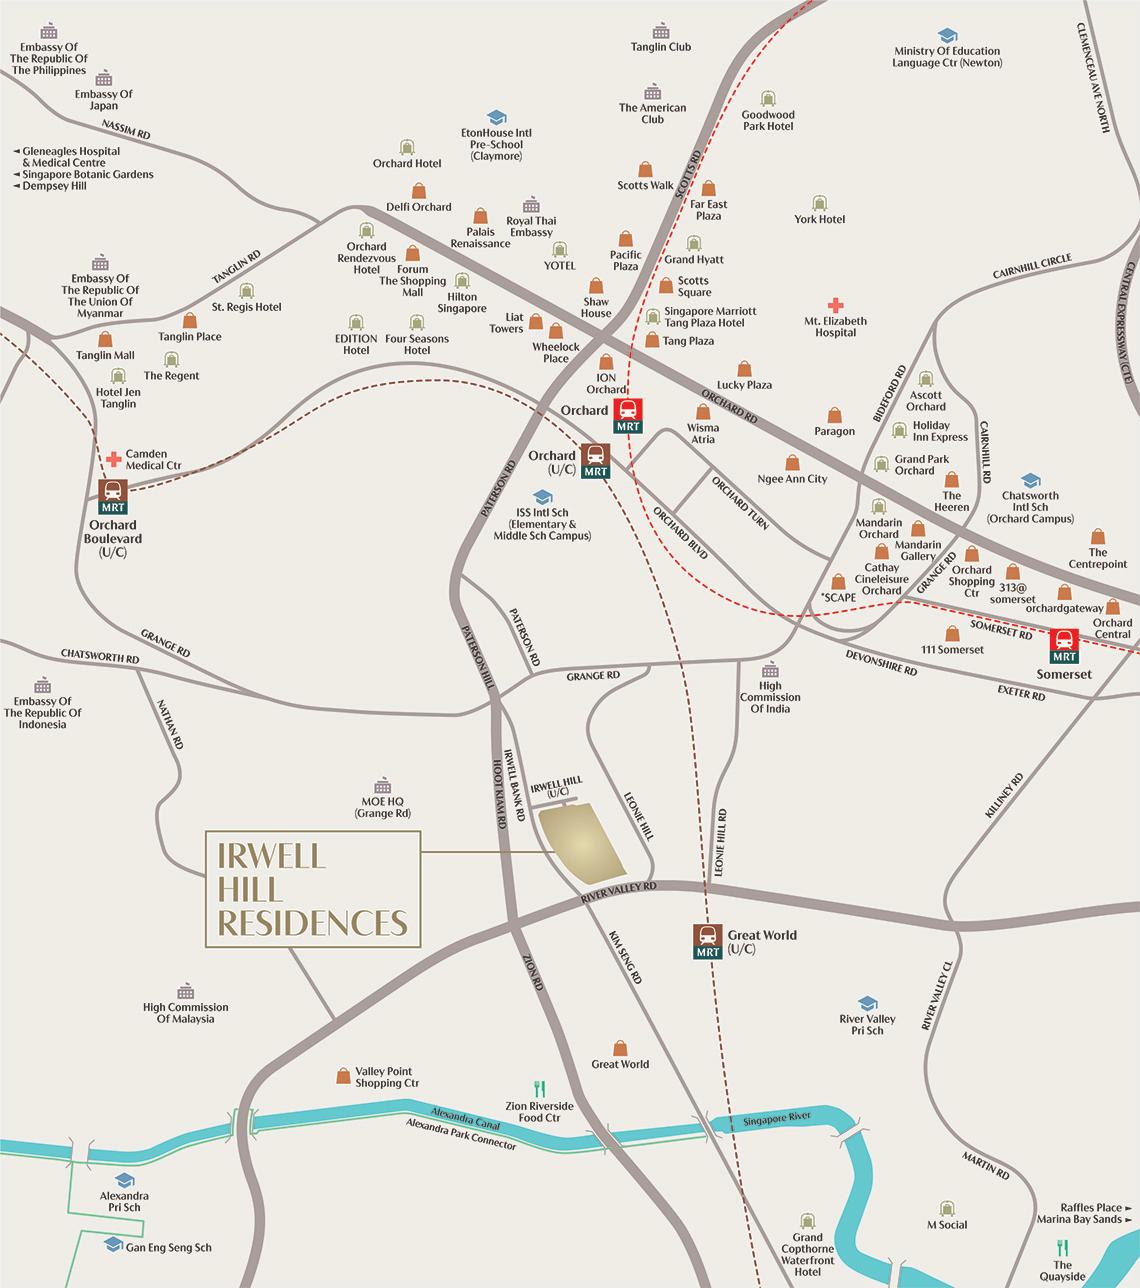 irwell hill residences 239588 sglp63690326